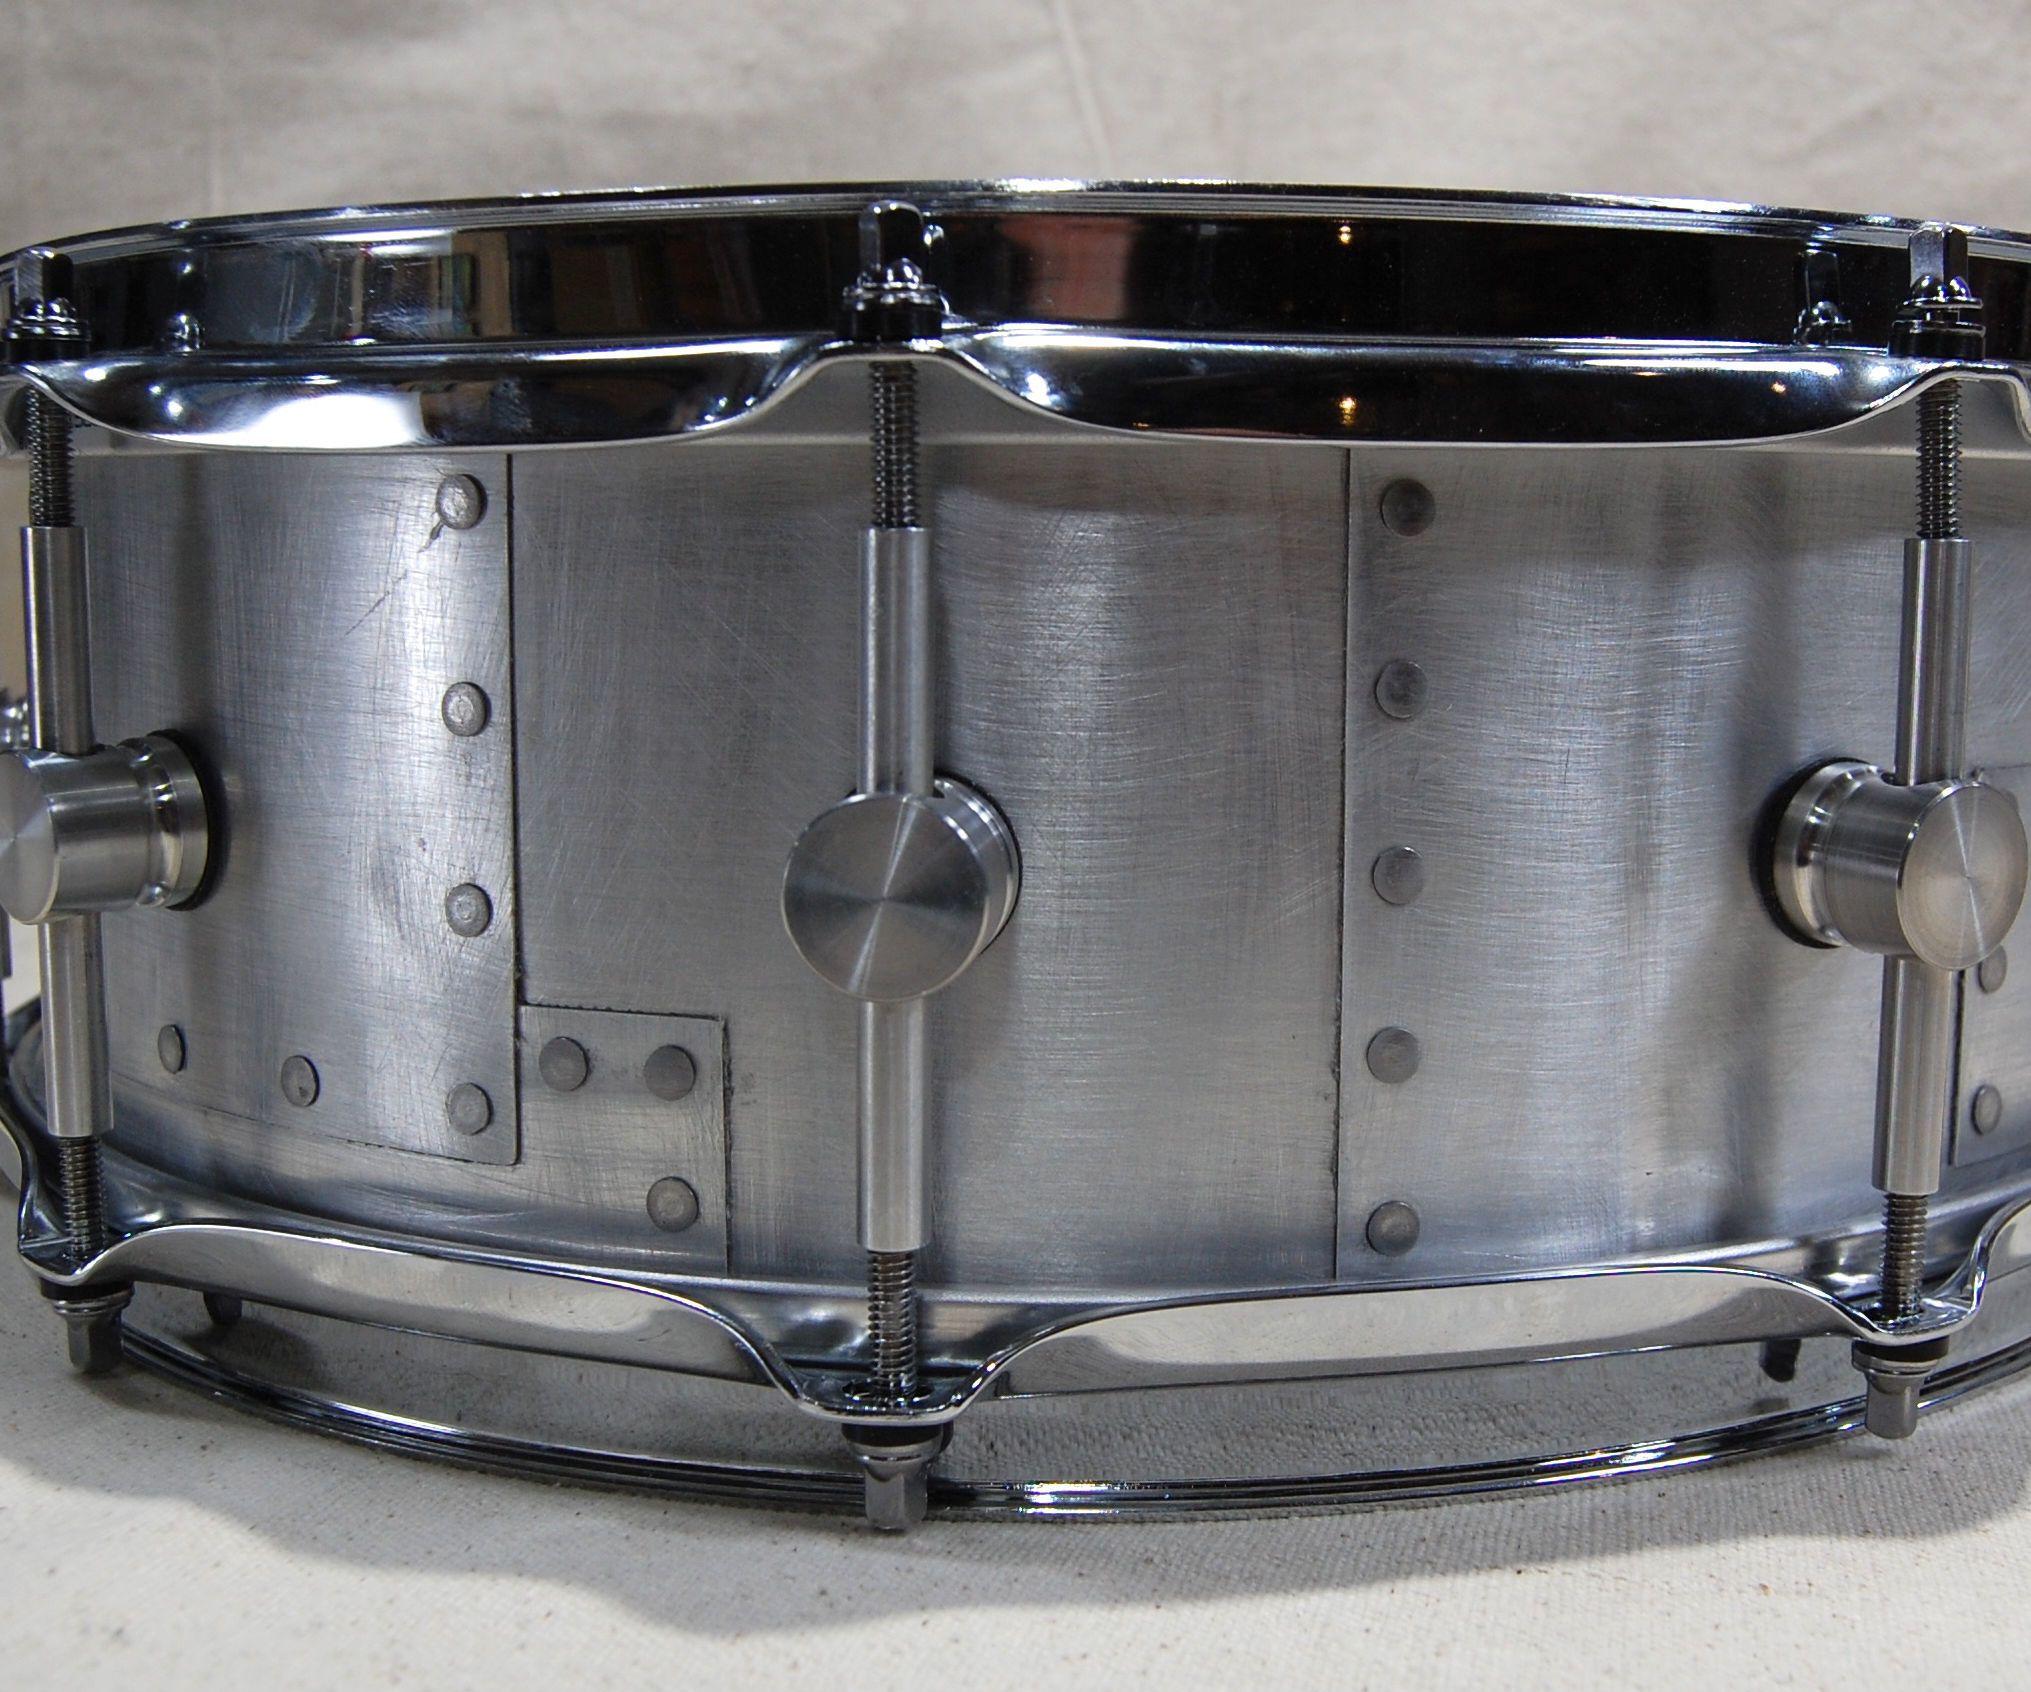 The Layered Sheet Metal Snare Drum Drums Snare Drum Metal Drum